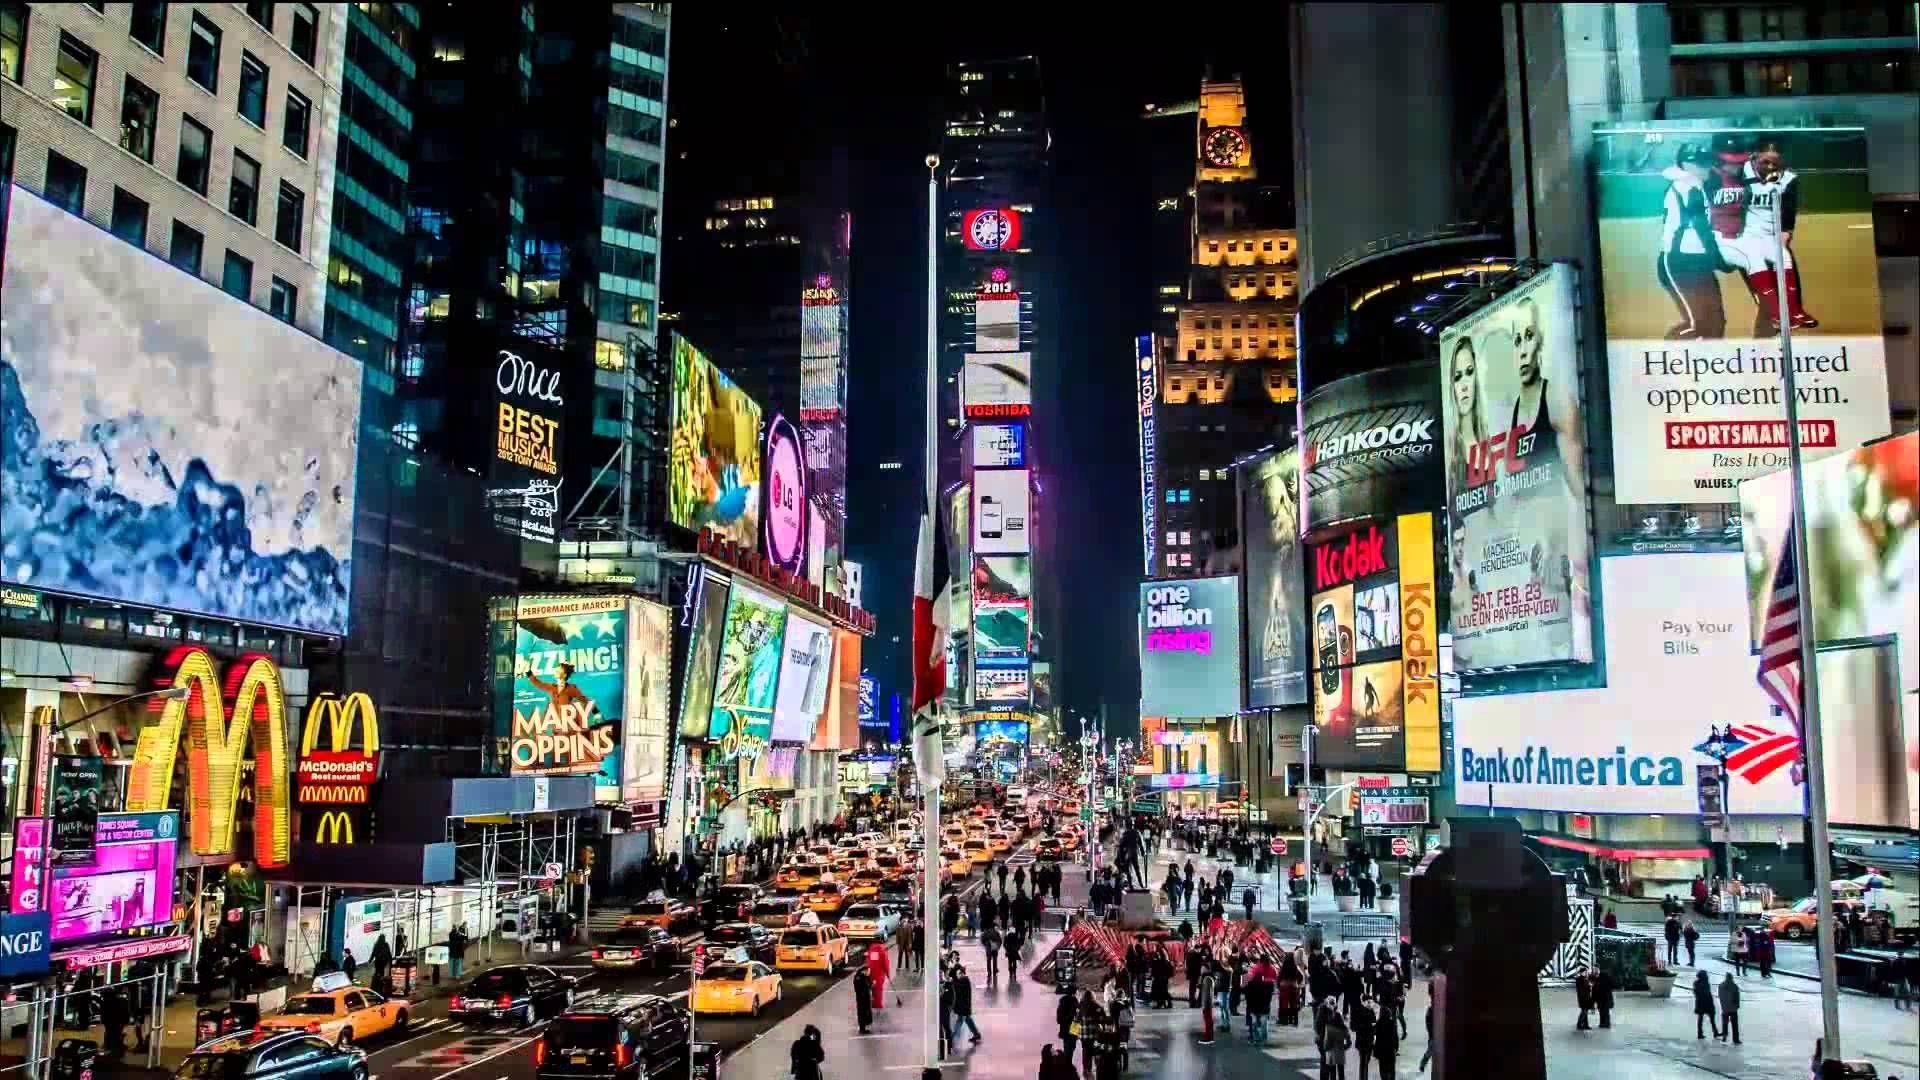 New York Times Square Time Lapse Night Shot Times Square New York Times Square Streaming Movies